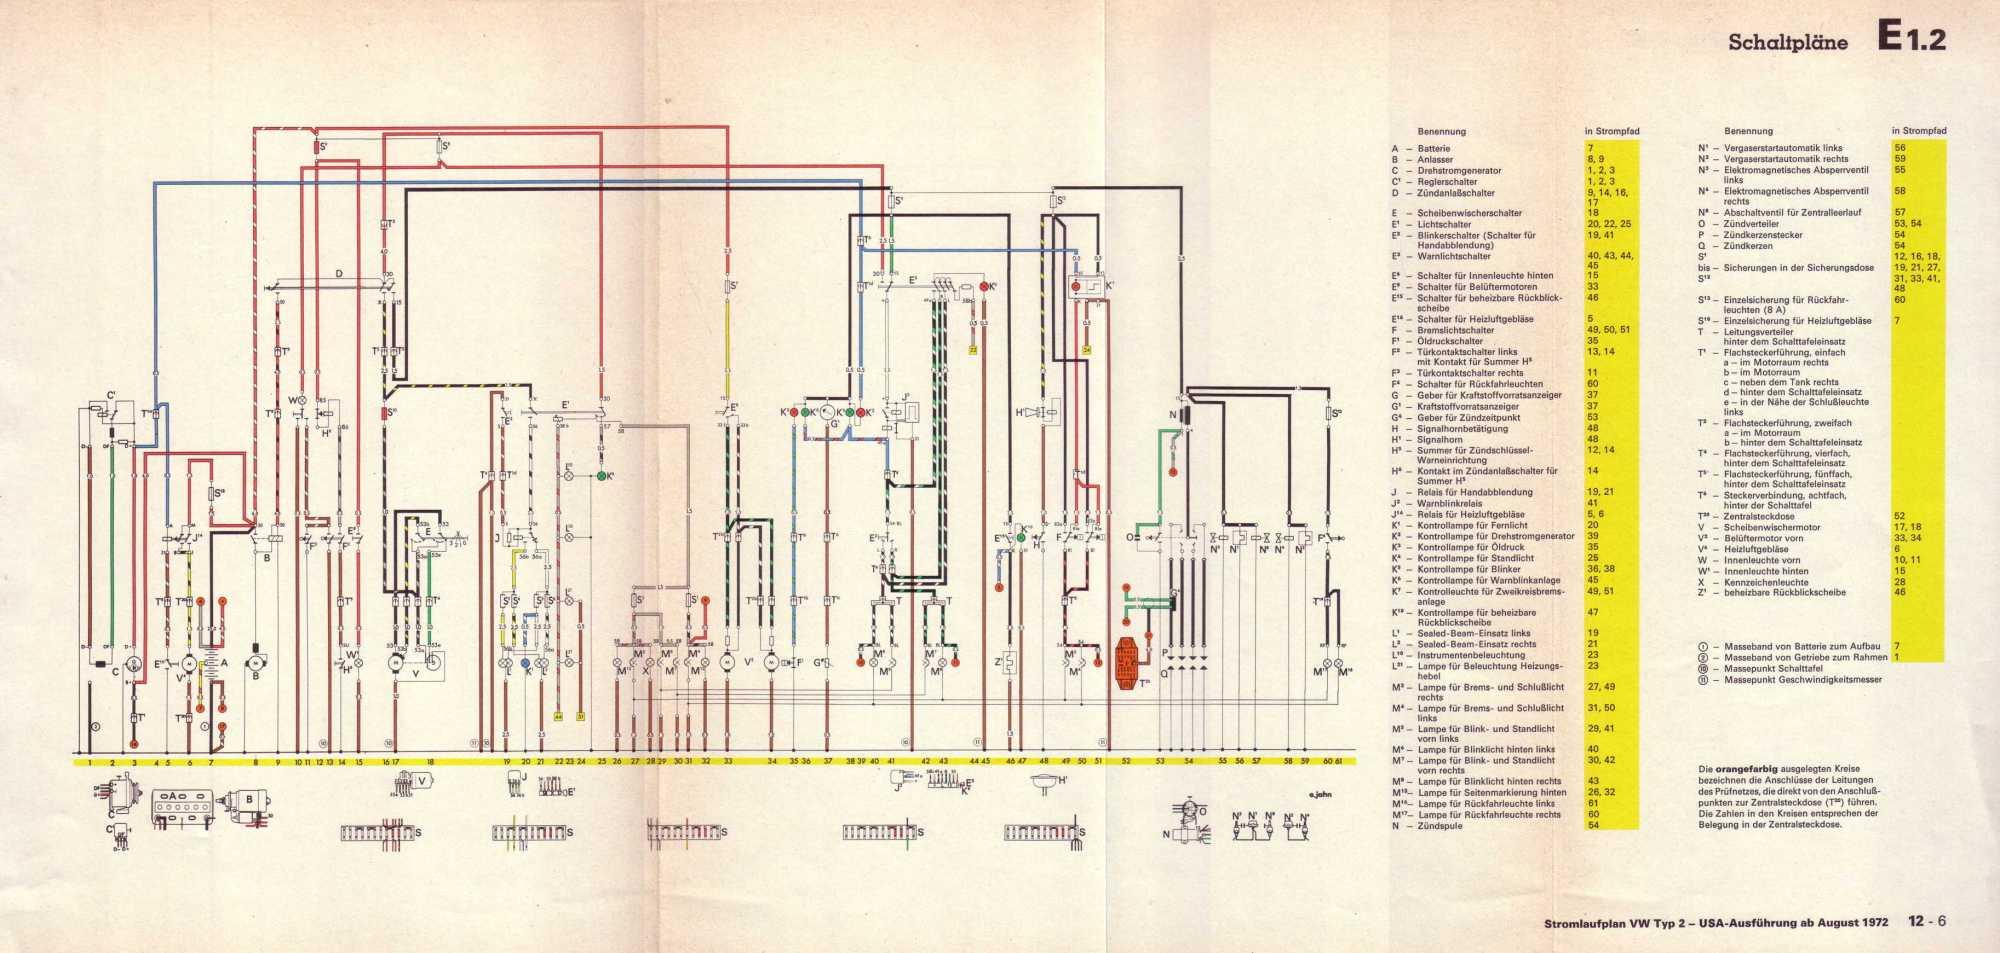 hight resolution of  volkswagen transporter 1 8 l vergasermotor usa ab august 1973